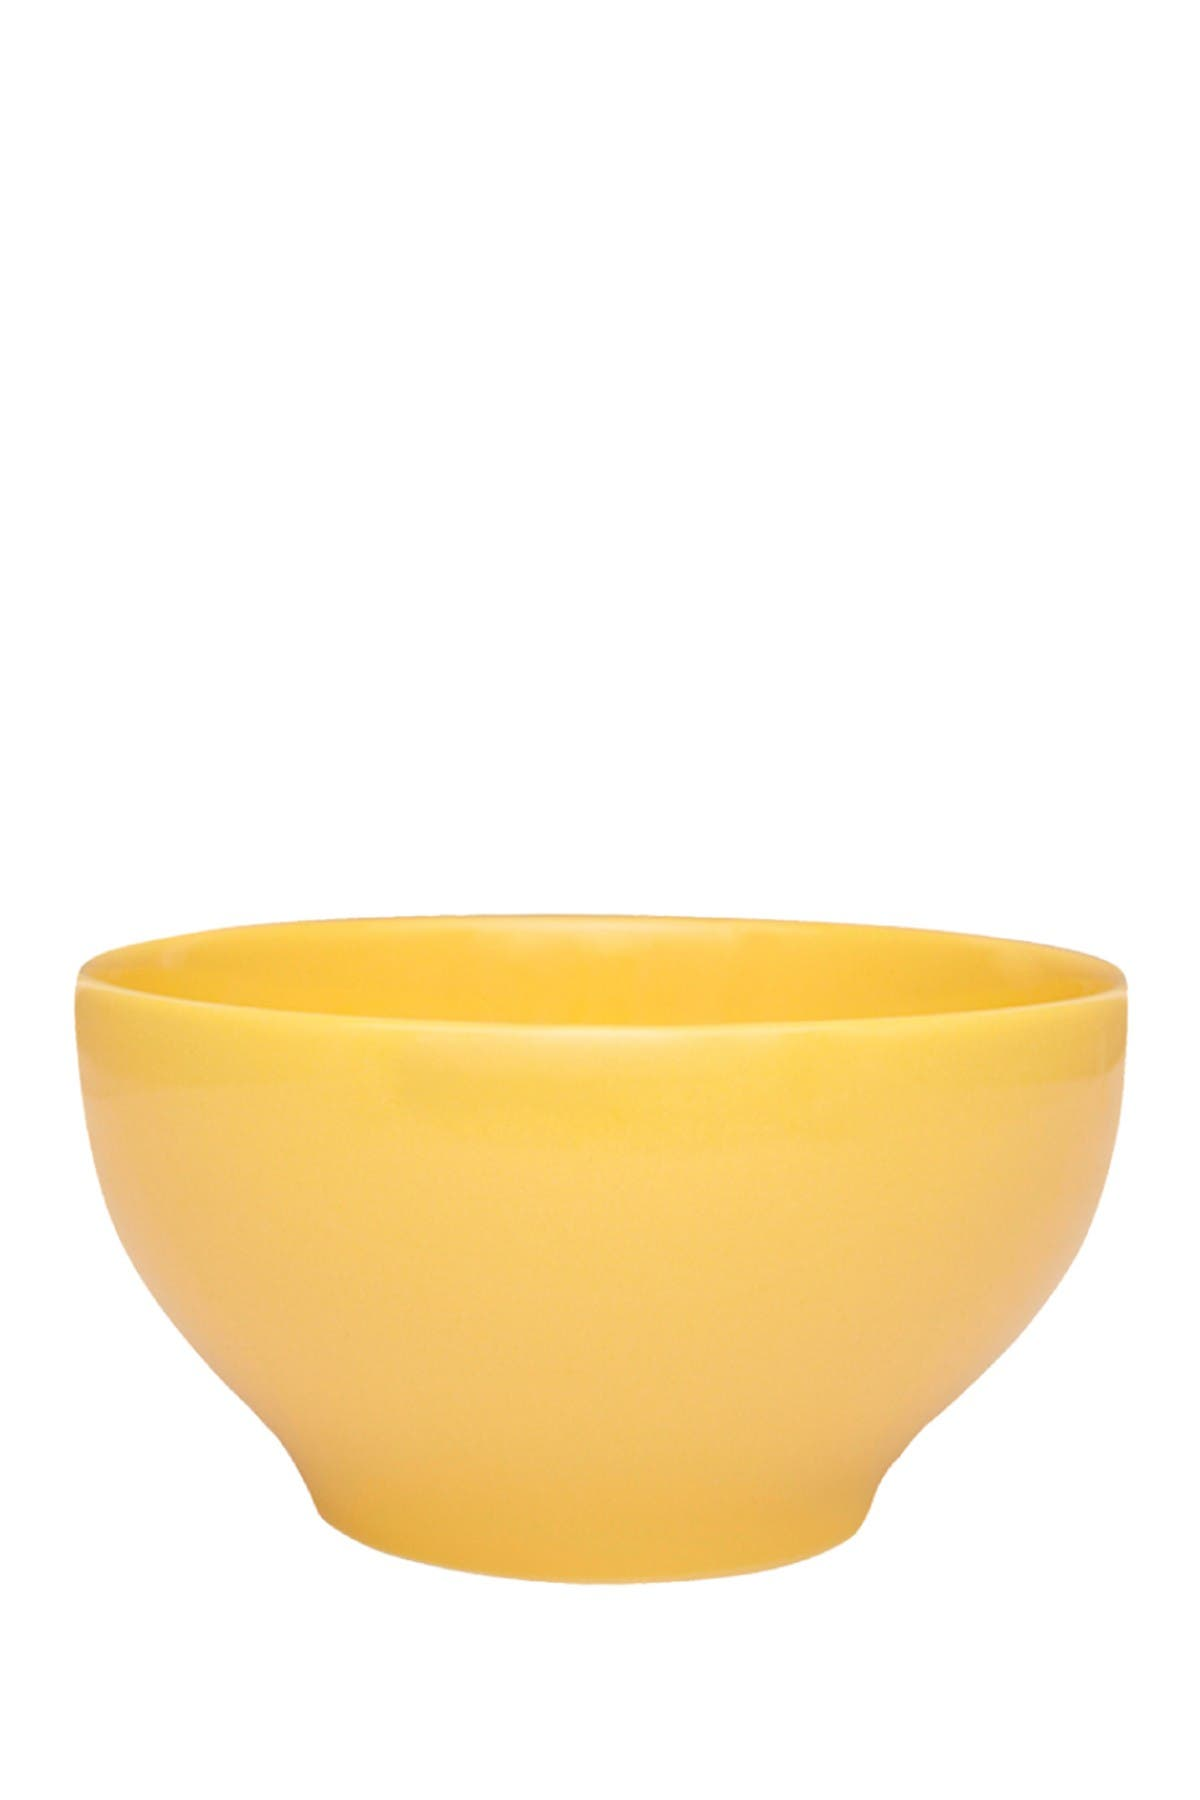 Image of Manhattan Comfort Actual 6 Large 20.29 oz. Dinner Soup Bowls - Yellow